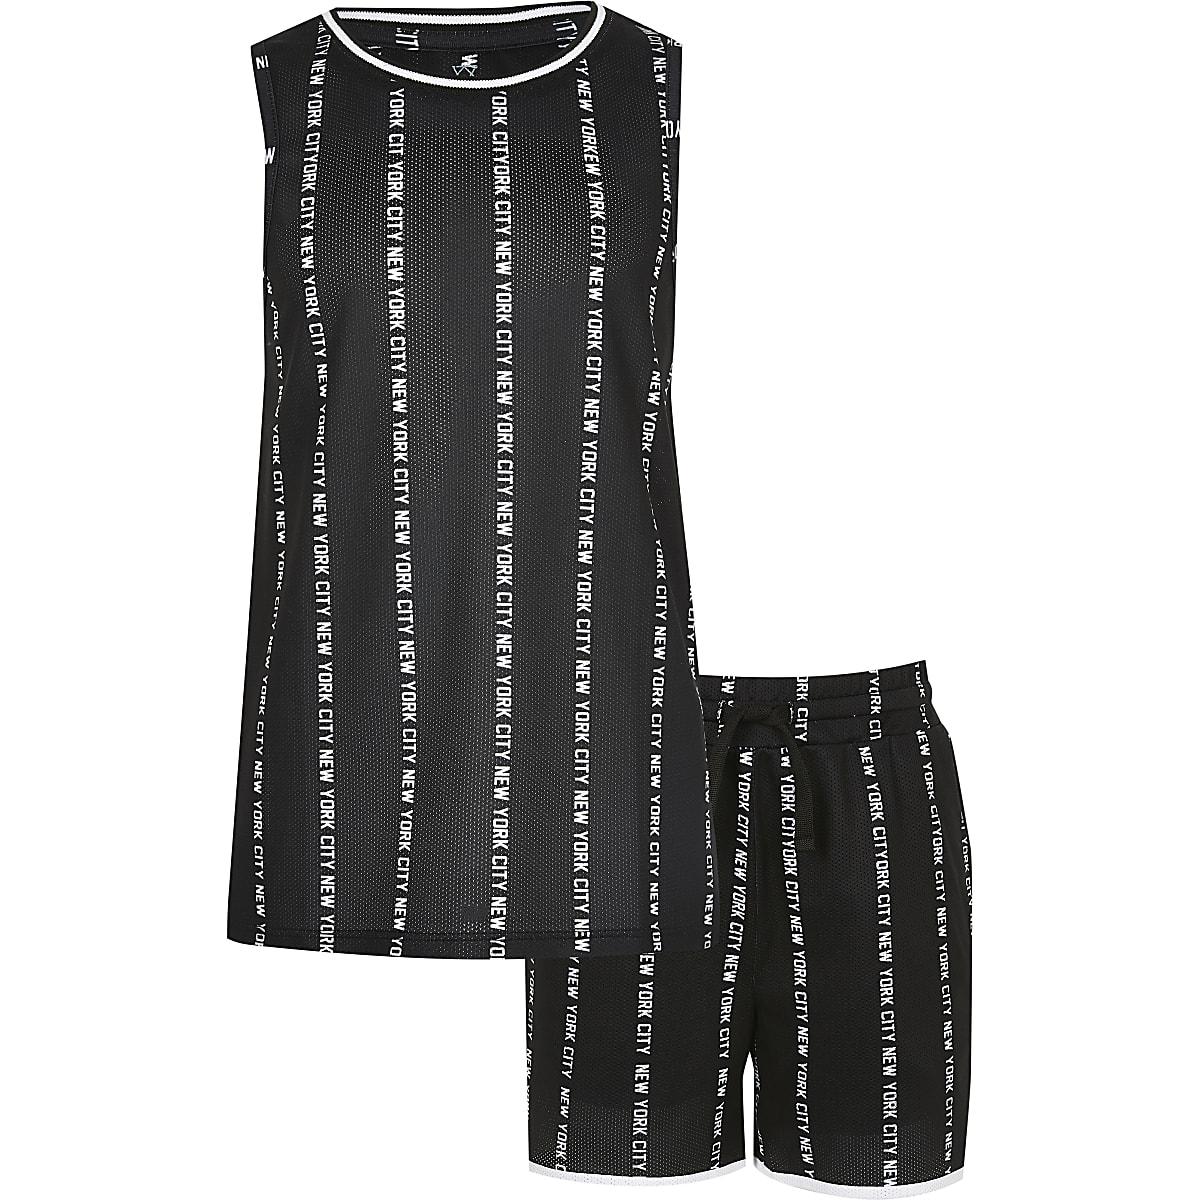 Boys black 'New York city' print tank outfit